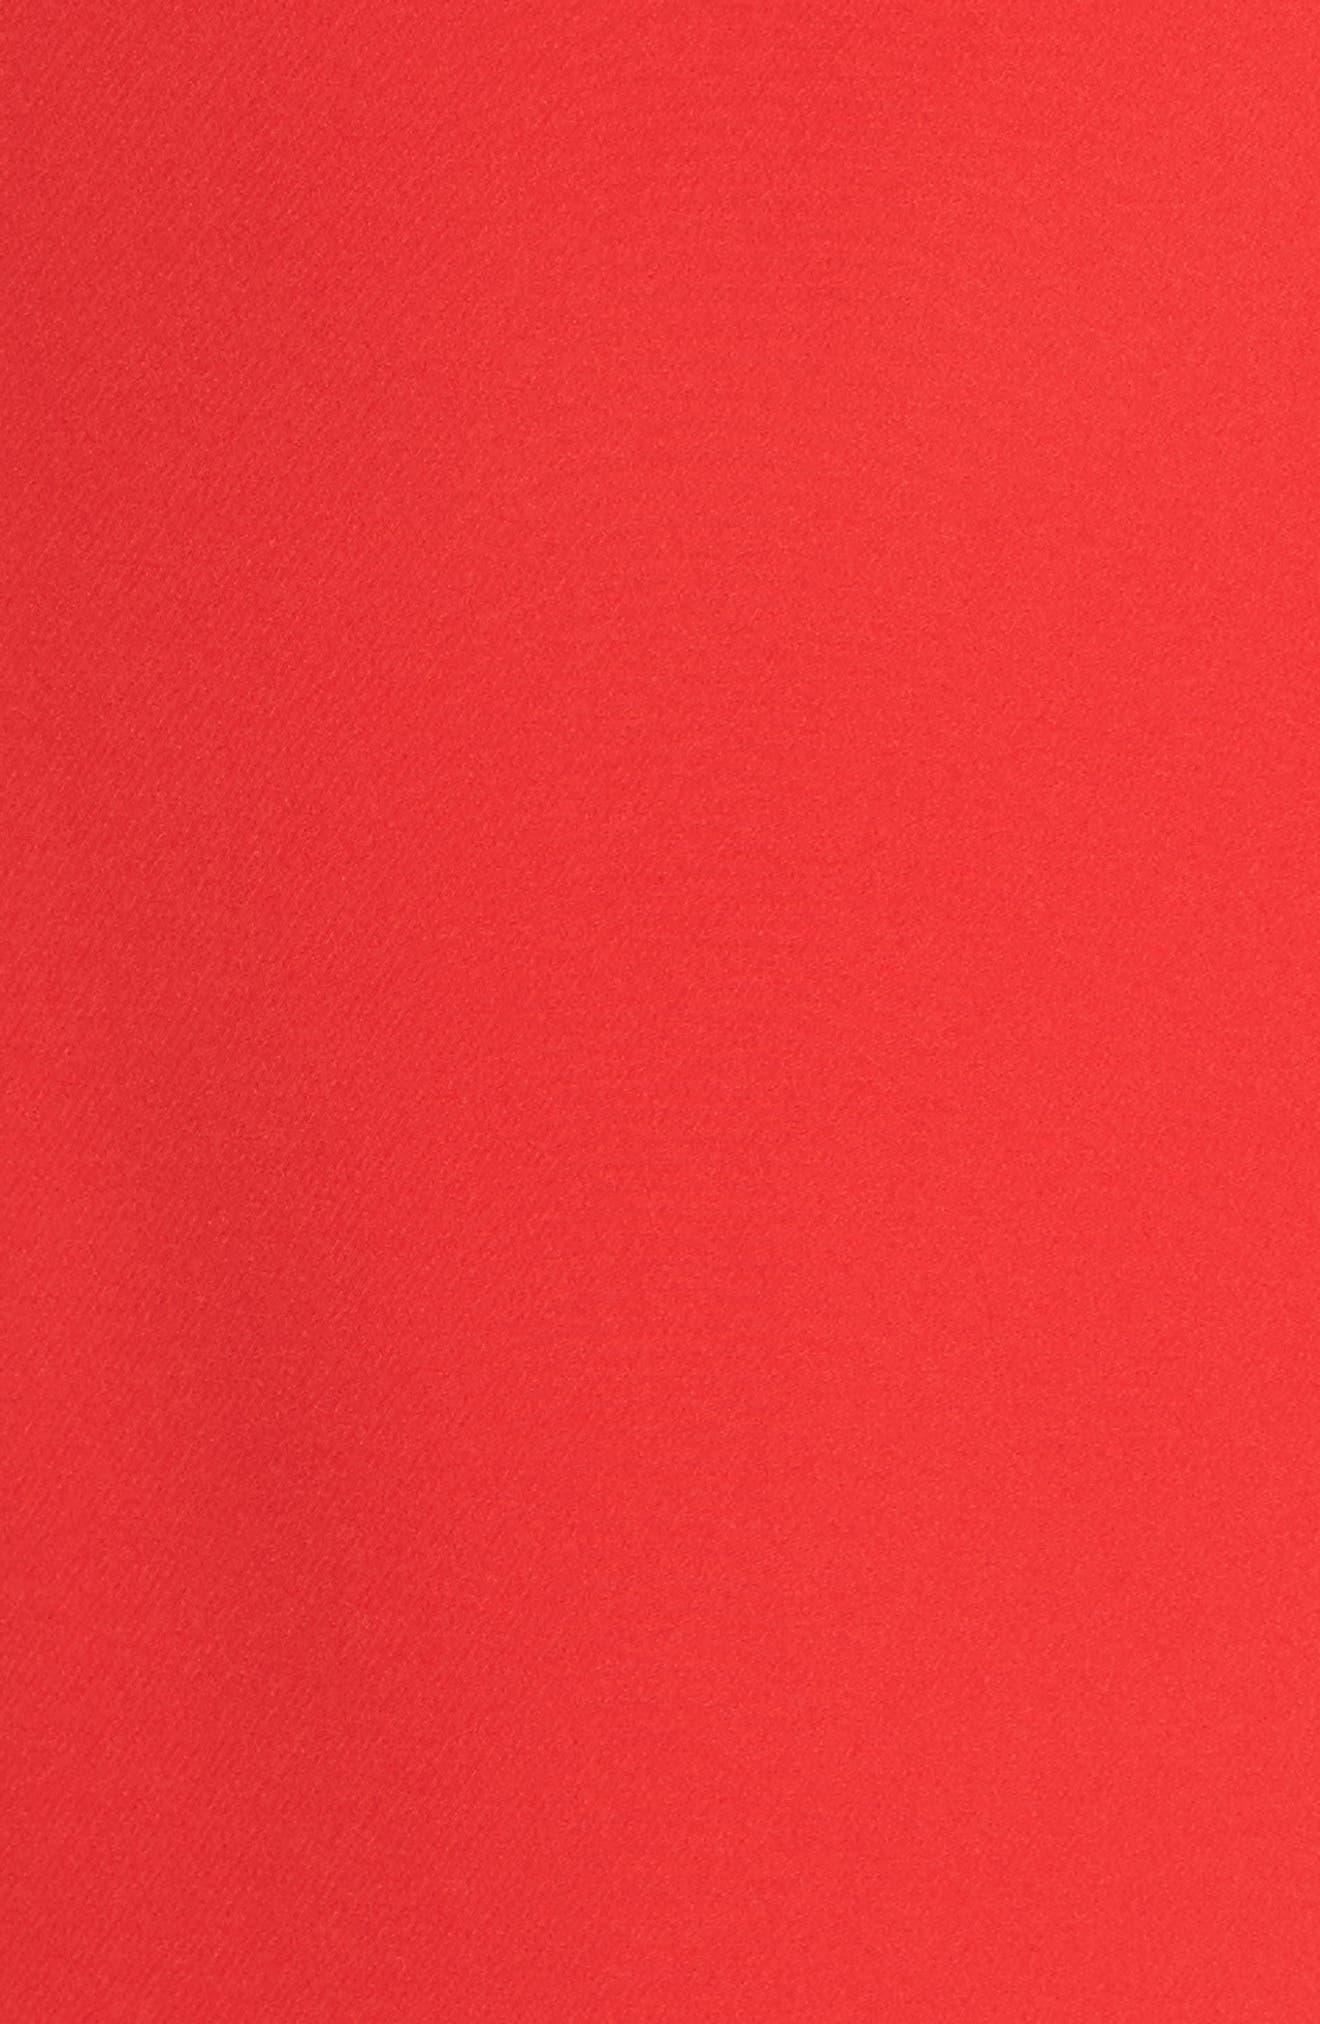 Ruffle One-Shoulder Dress,                             Alternate thumbnail 5, color,